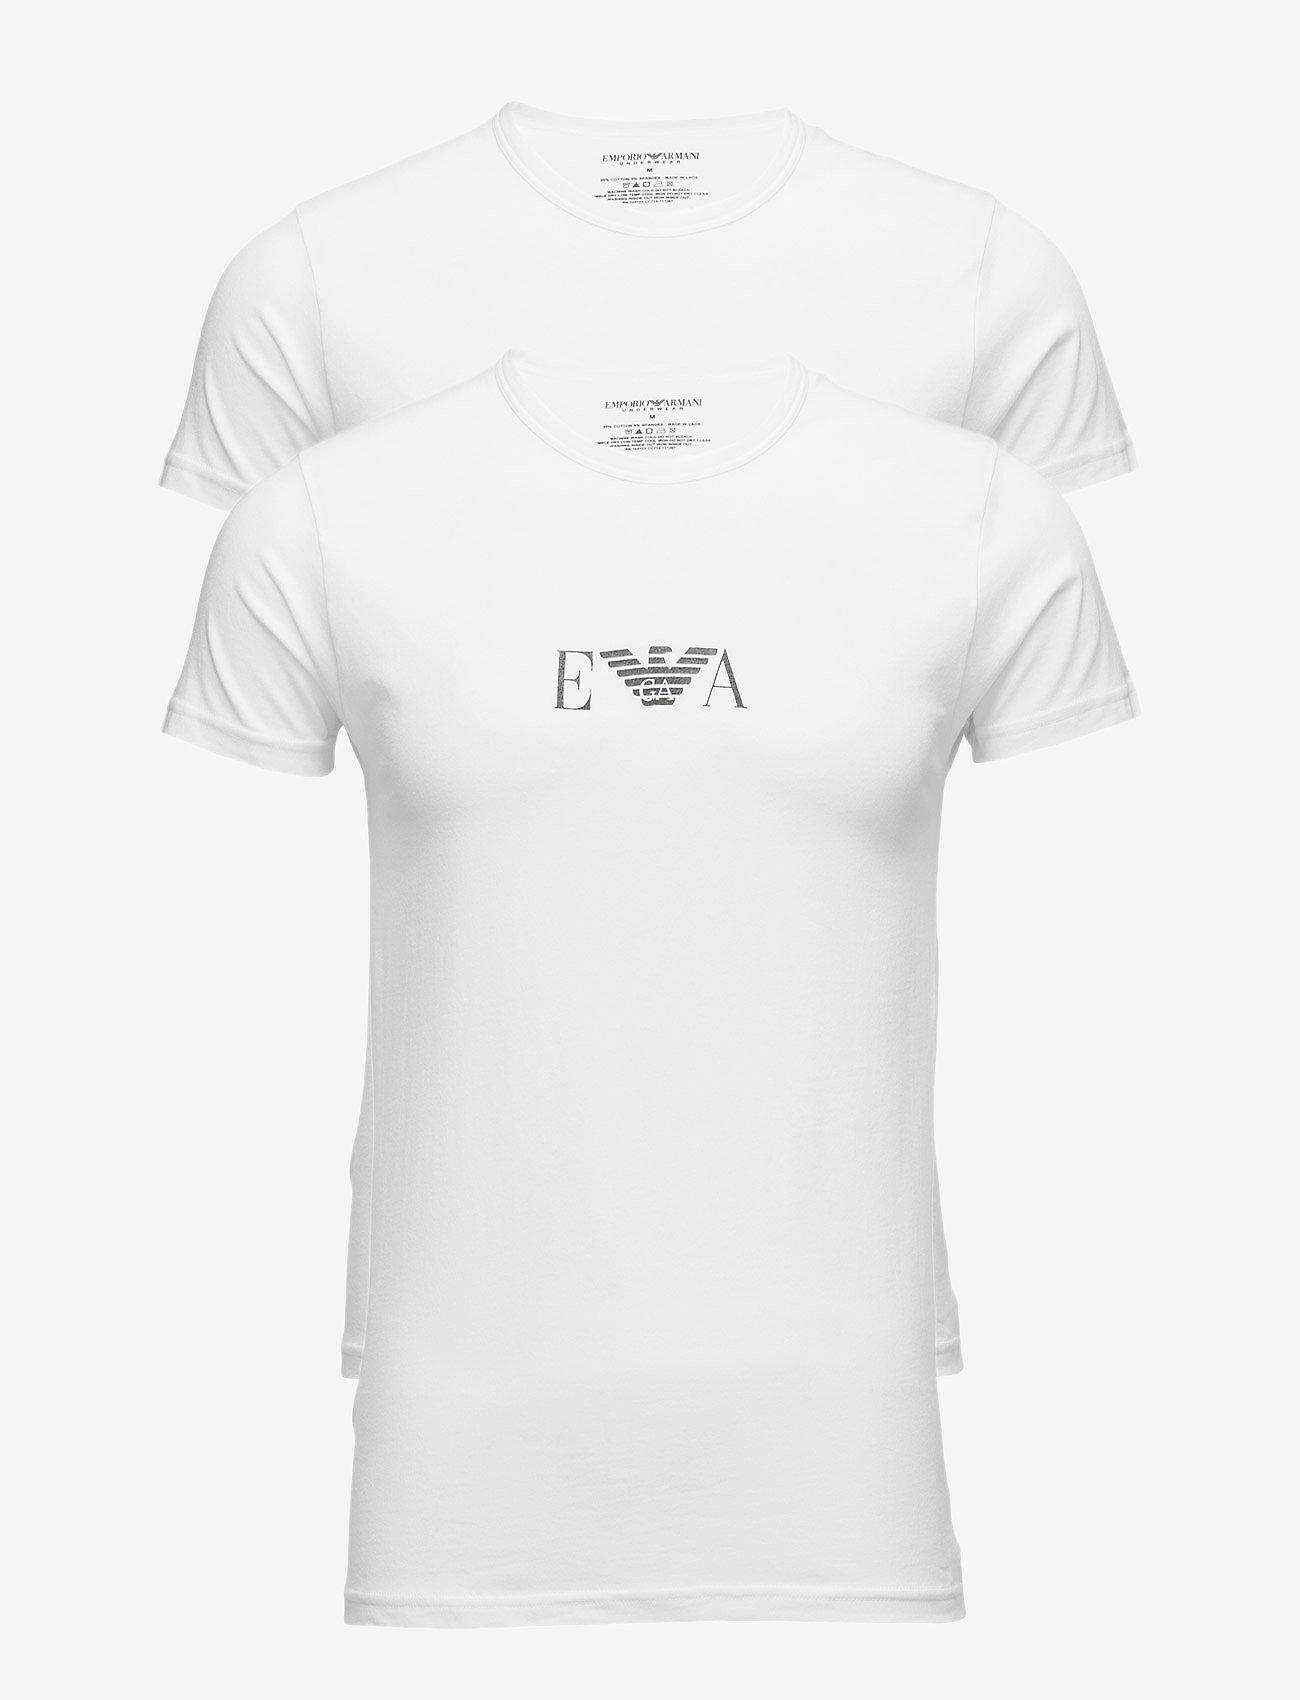 Emporio Armani - MENS KNIT 2PACK T-SH - kortärmade t-shirts - bianco/bianco - 0